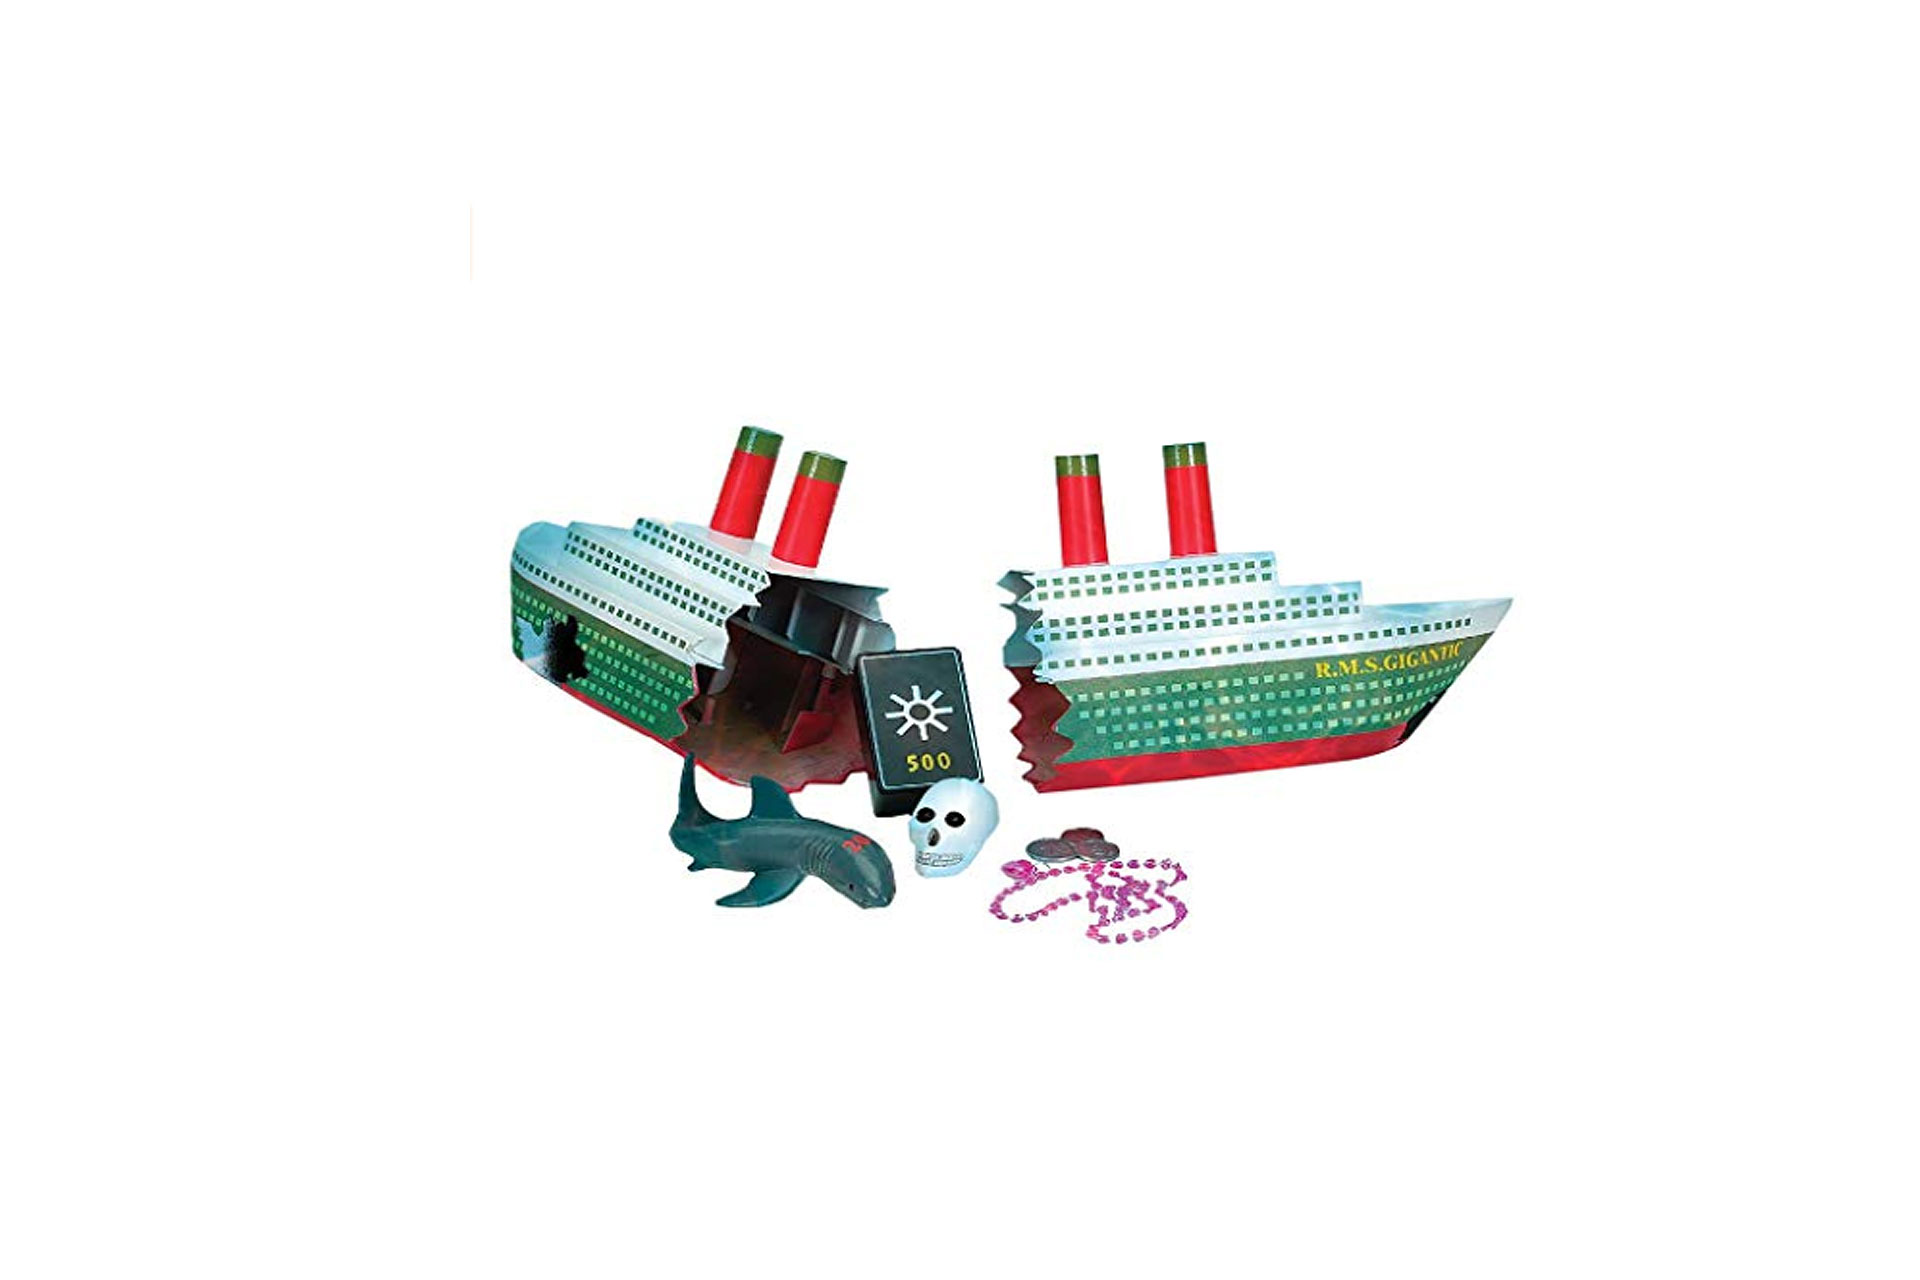 Swimline Shipwreck Pool Dive Game Toys; Courtesy of Amazon